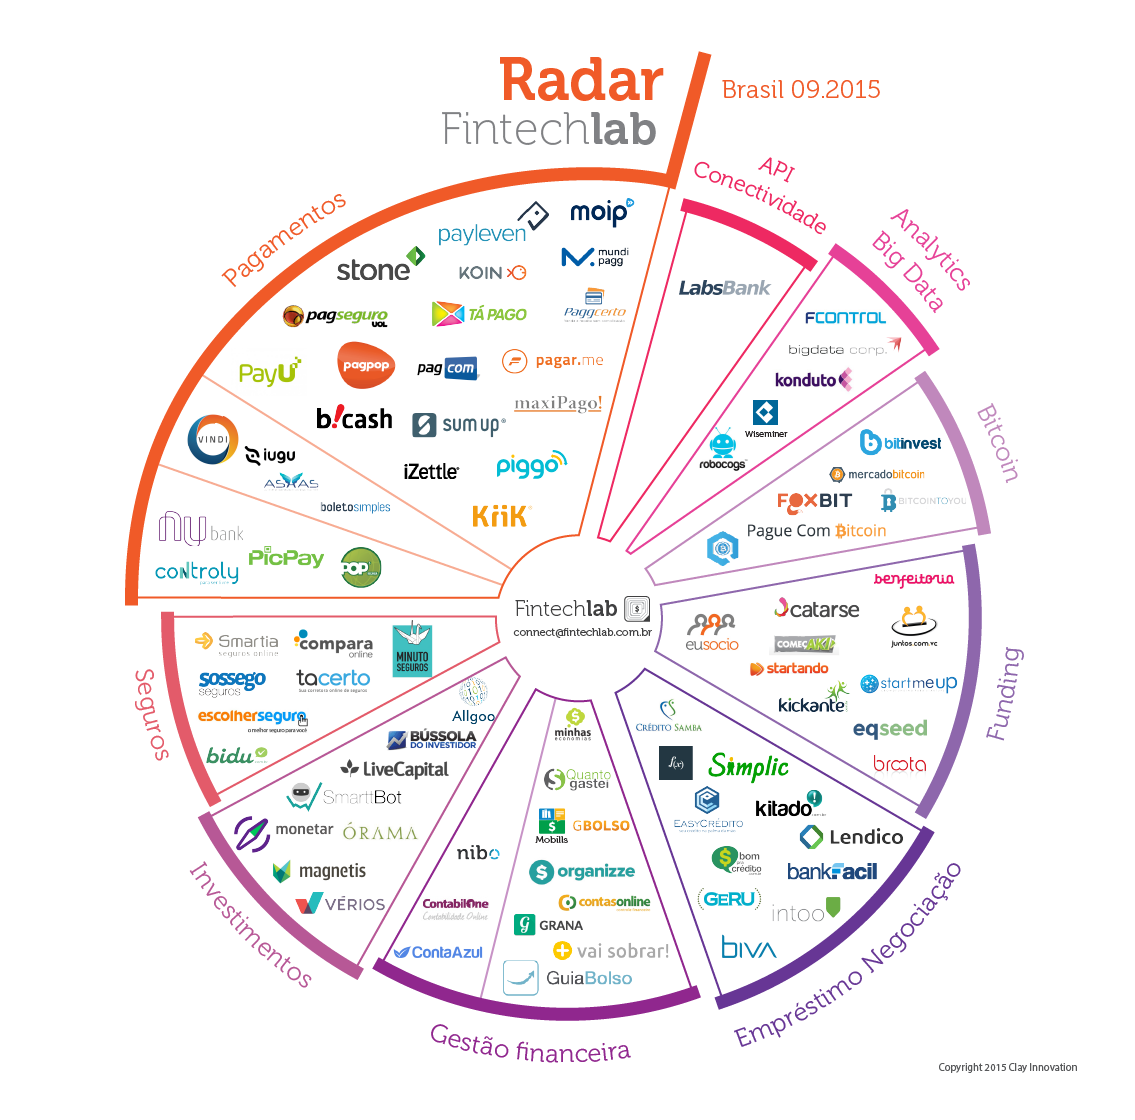 Radar_FintechLab_set15_v5